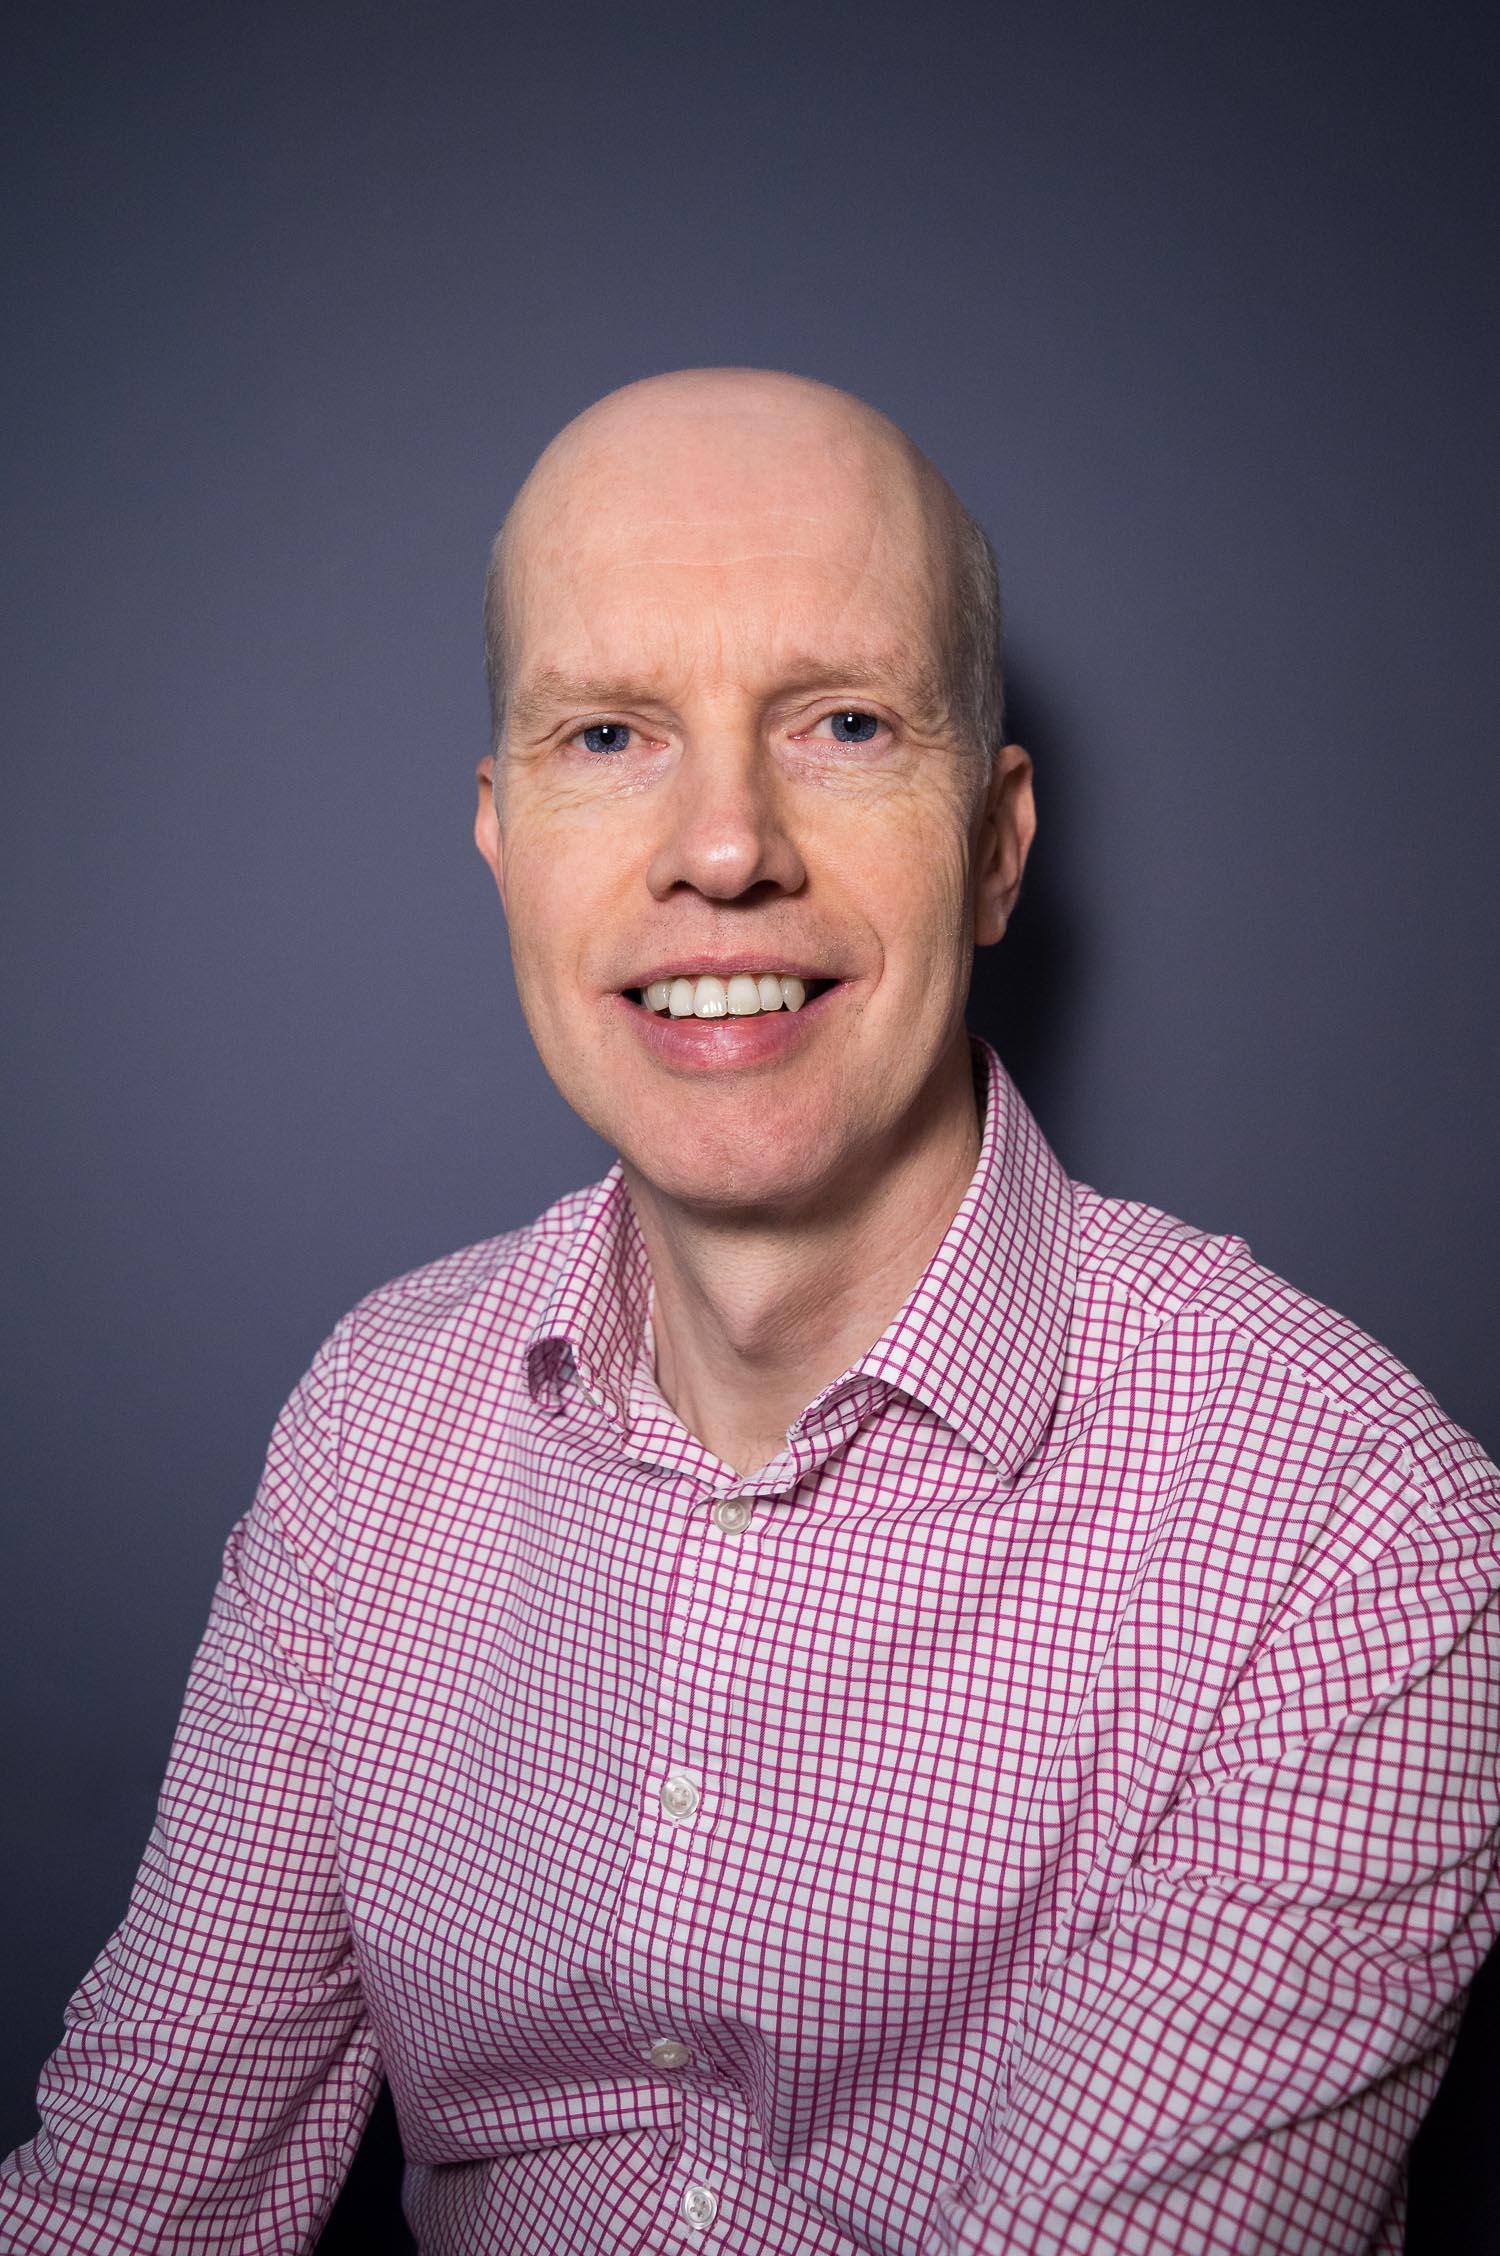 Craig Govan B.Arch(Hons)Dip. Arc RIAS  Director  craiggovan@mcleanarchitects.co.uk